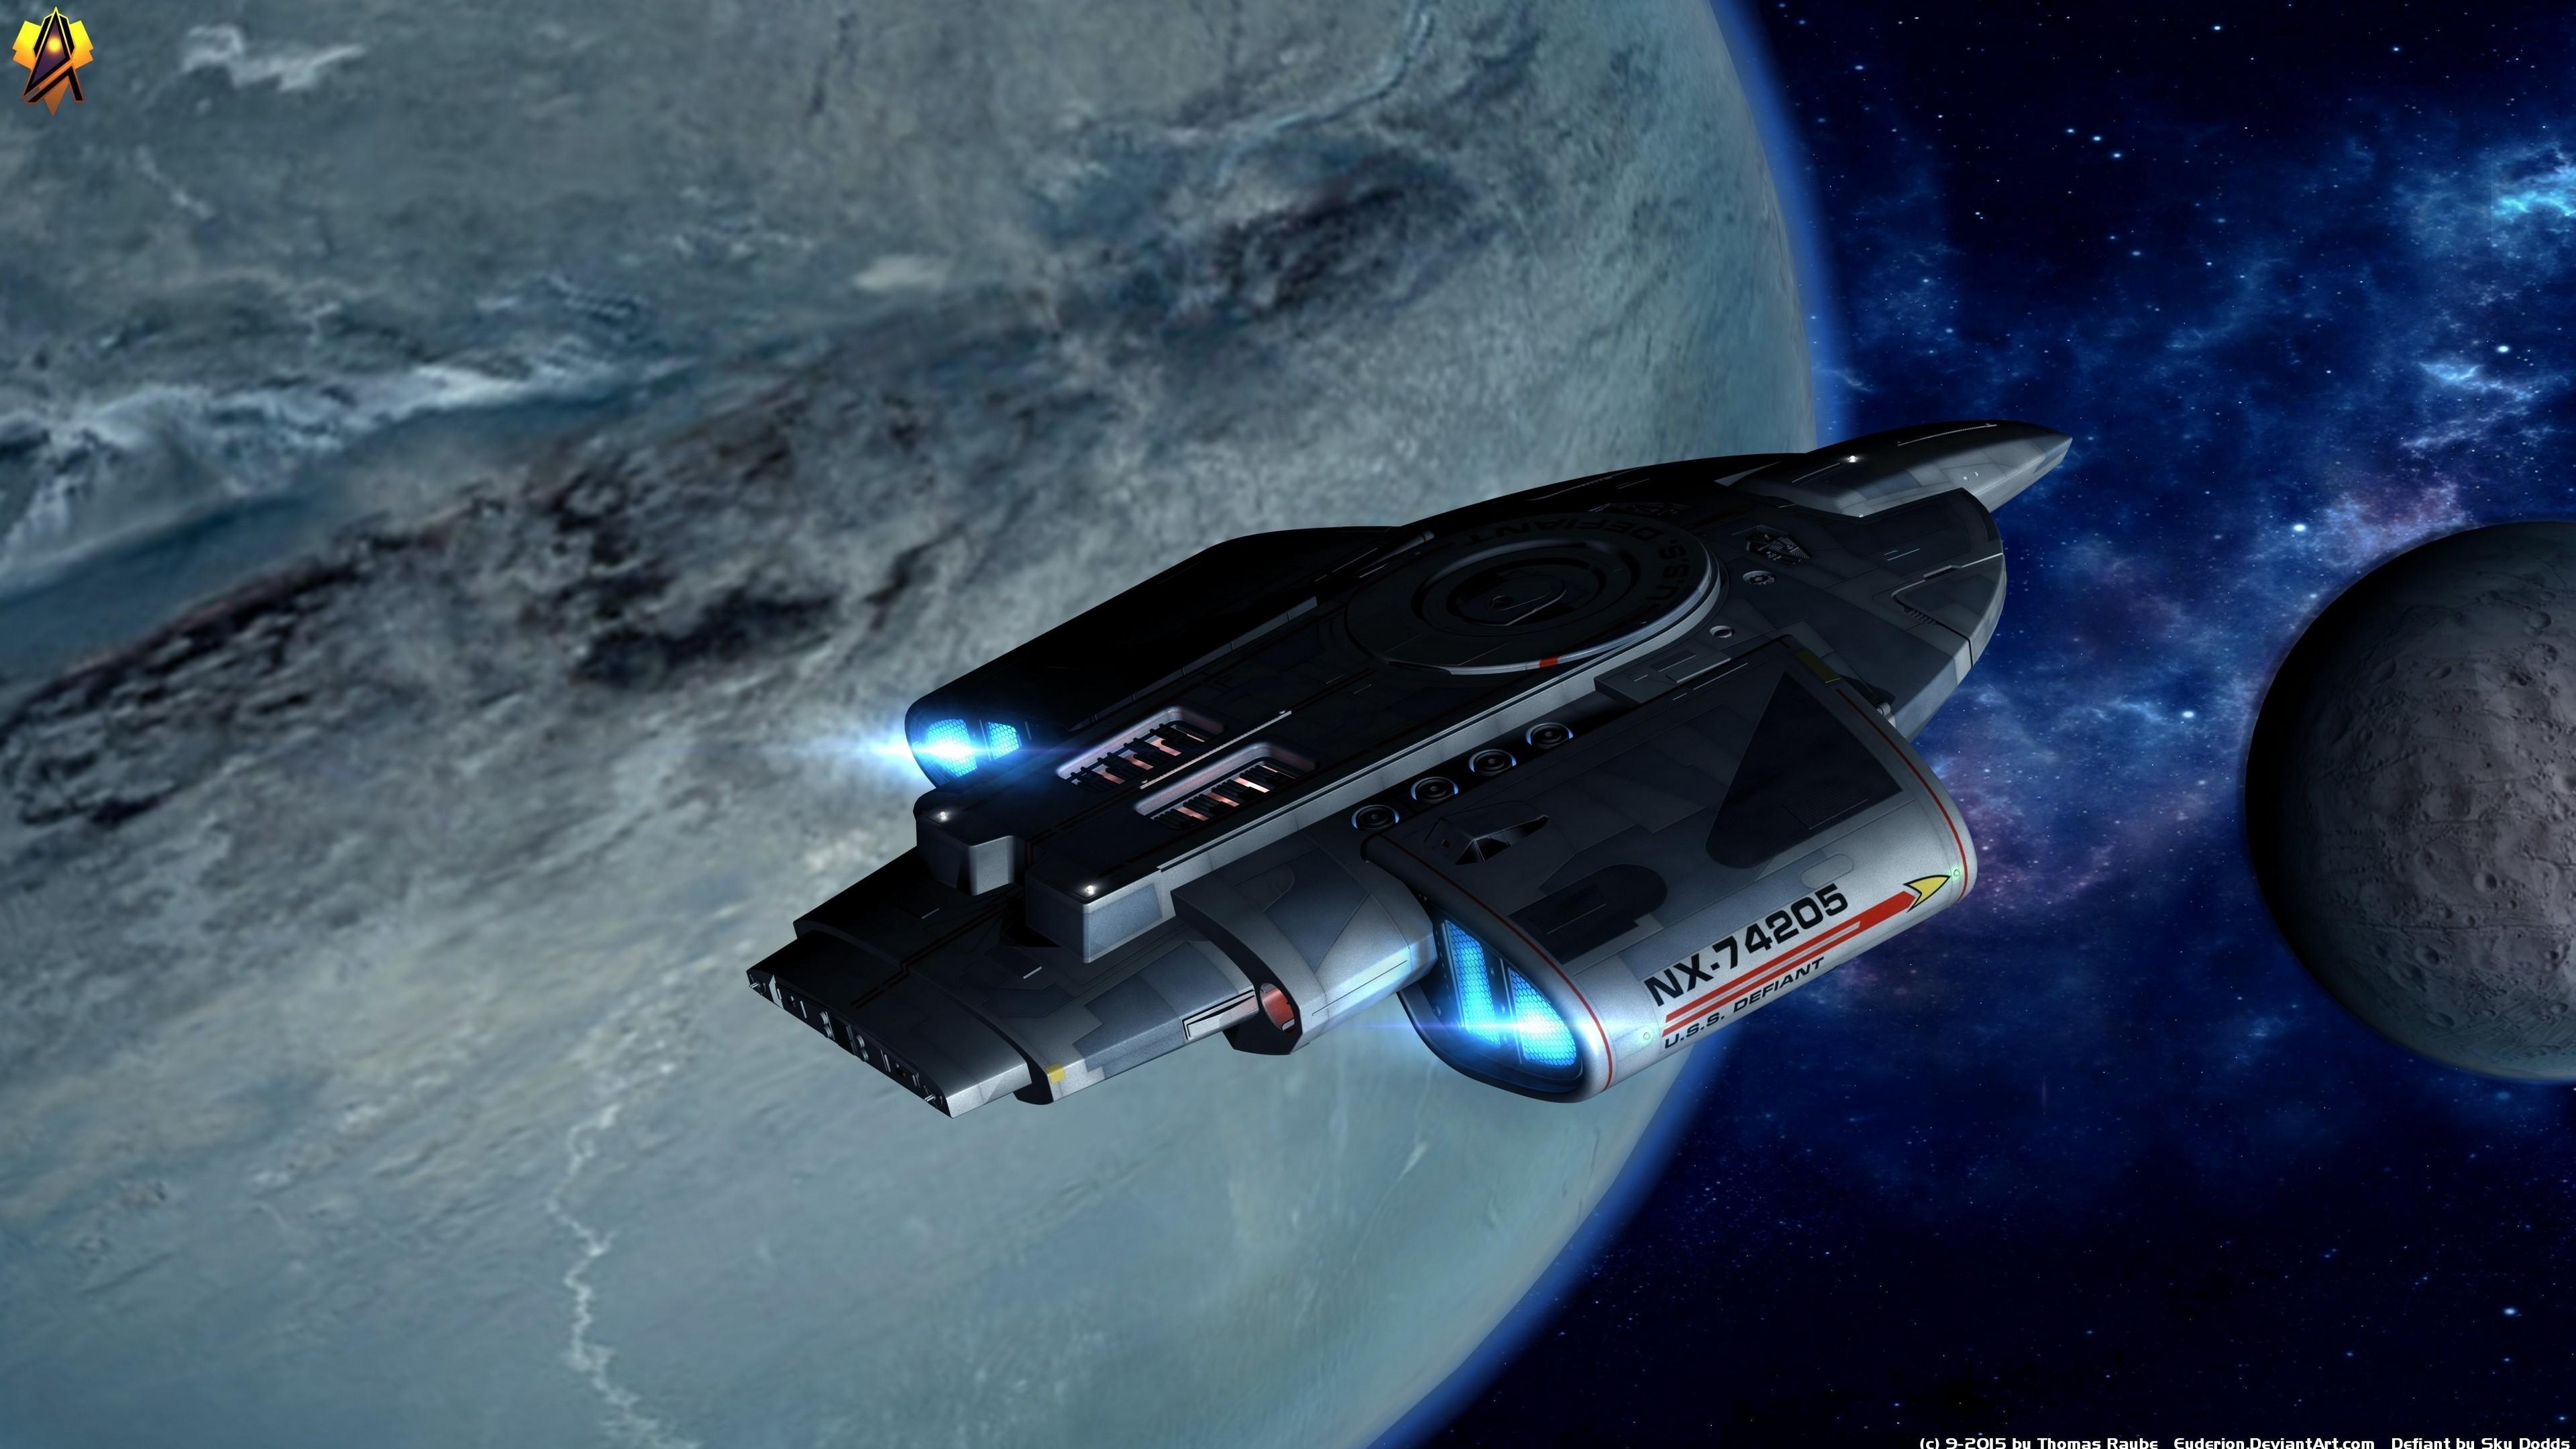 Star Trek Deep Space Nine Starship Star Trek Wallpaper